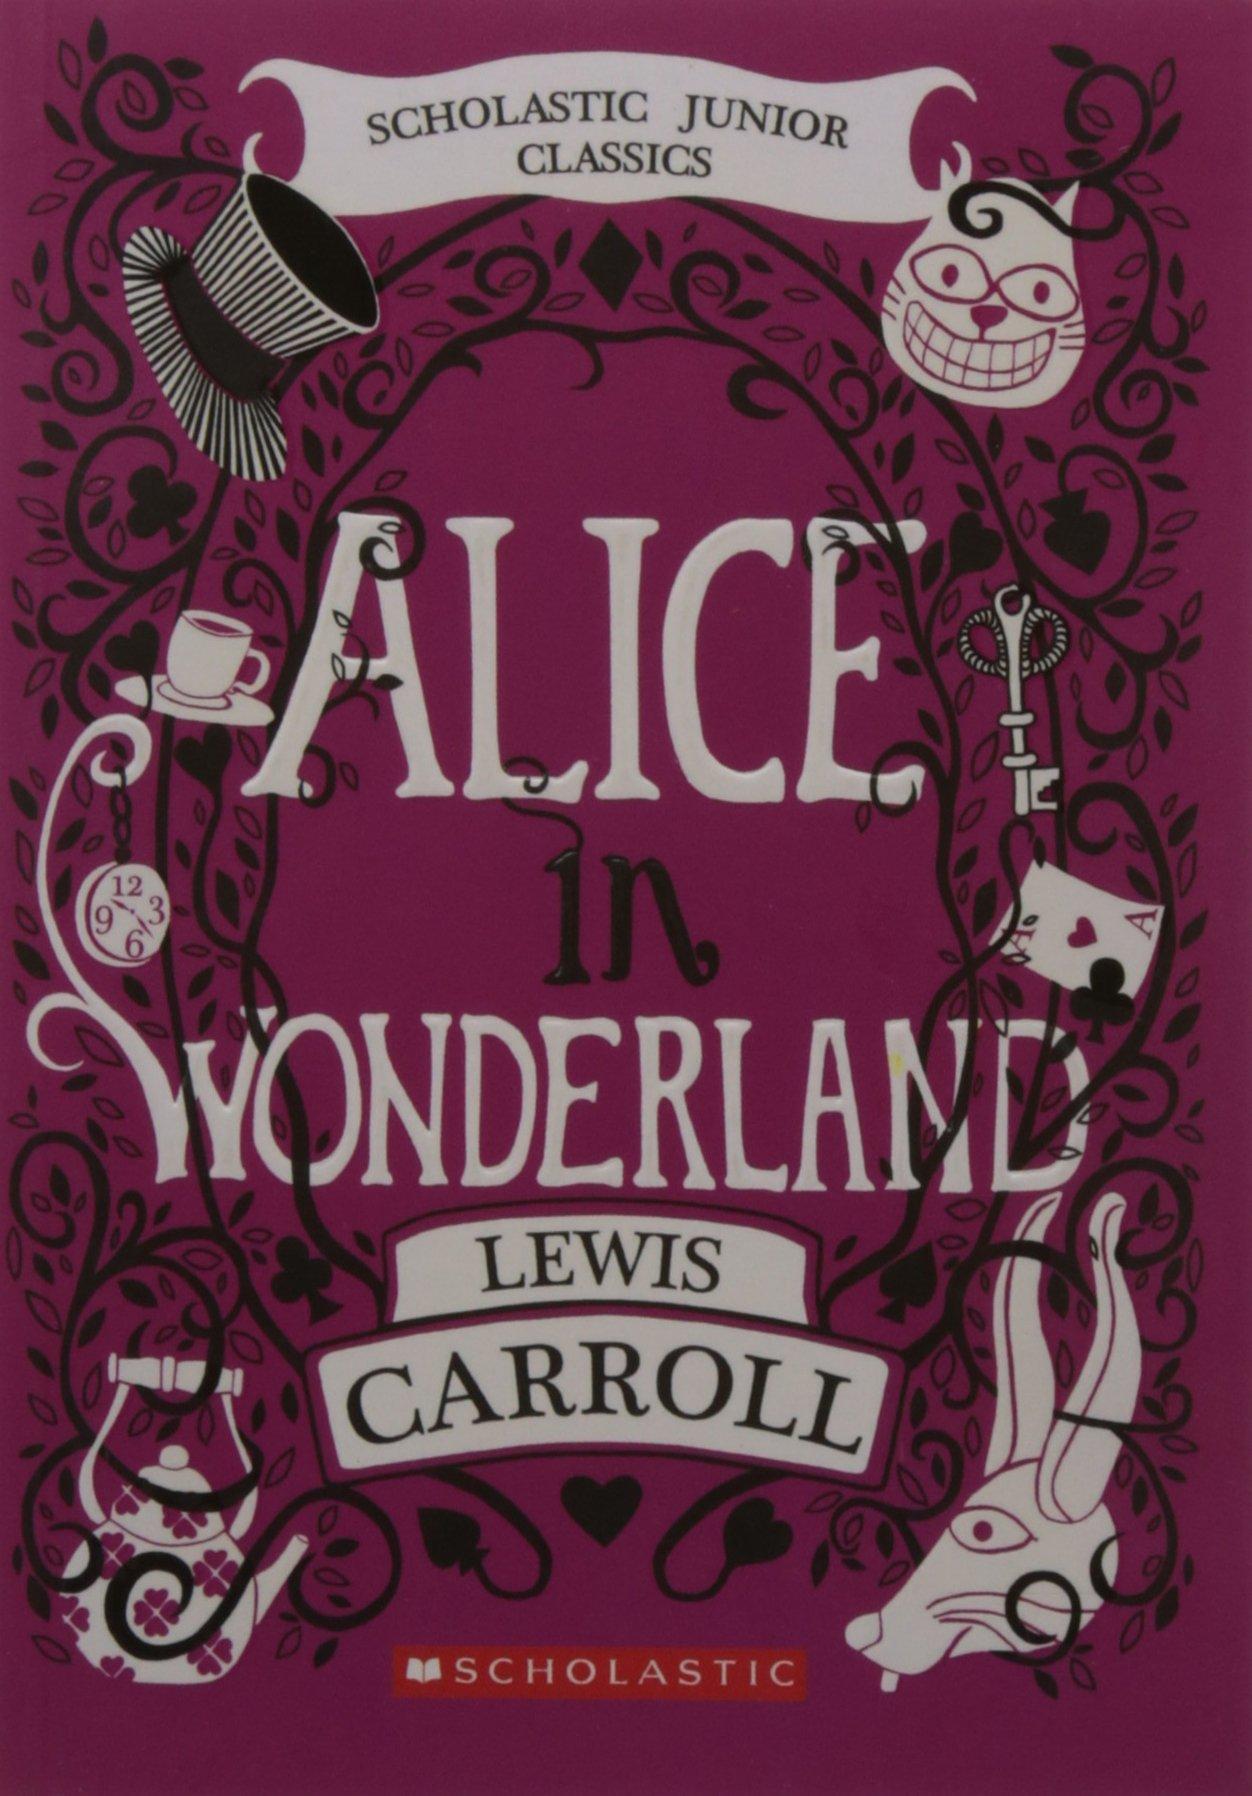 alice in wonderland 2010 mp4 free download